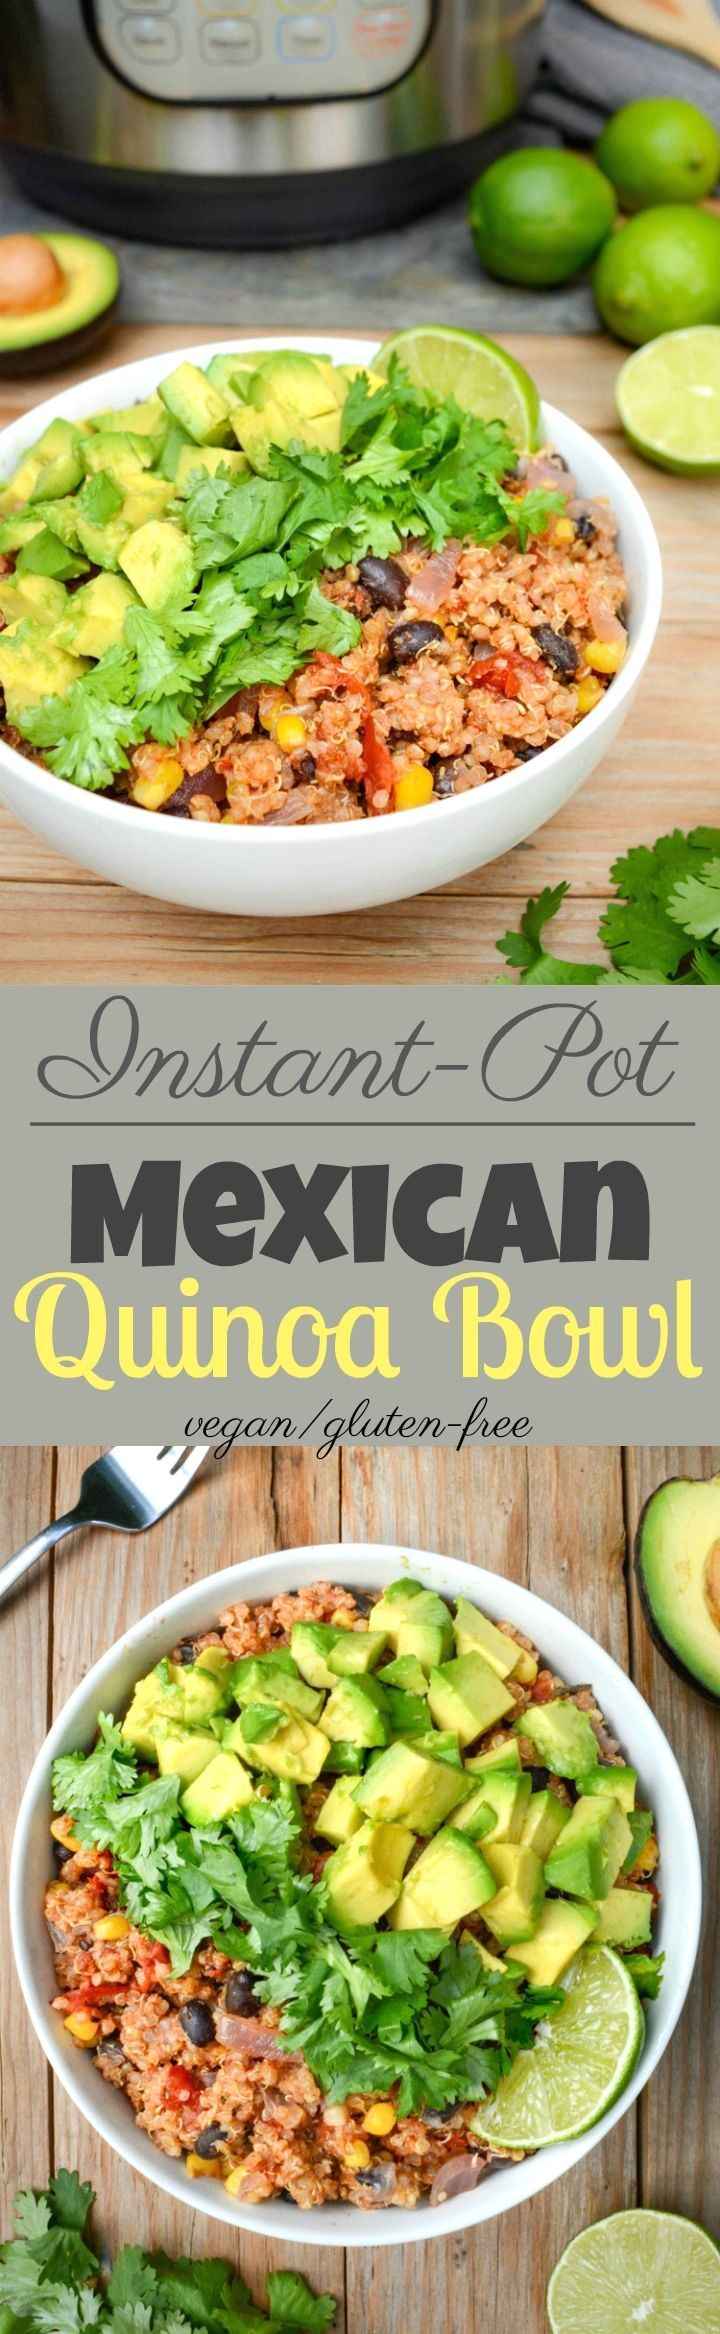 Instant Pot Mexican Quinoa Bowl - vegan | Where You Get Your Protein - Vegan Recipes